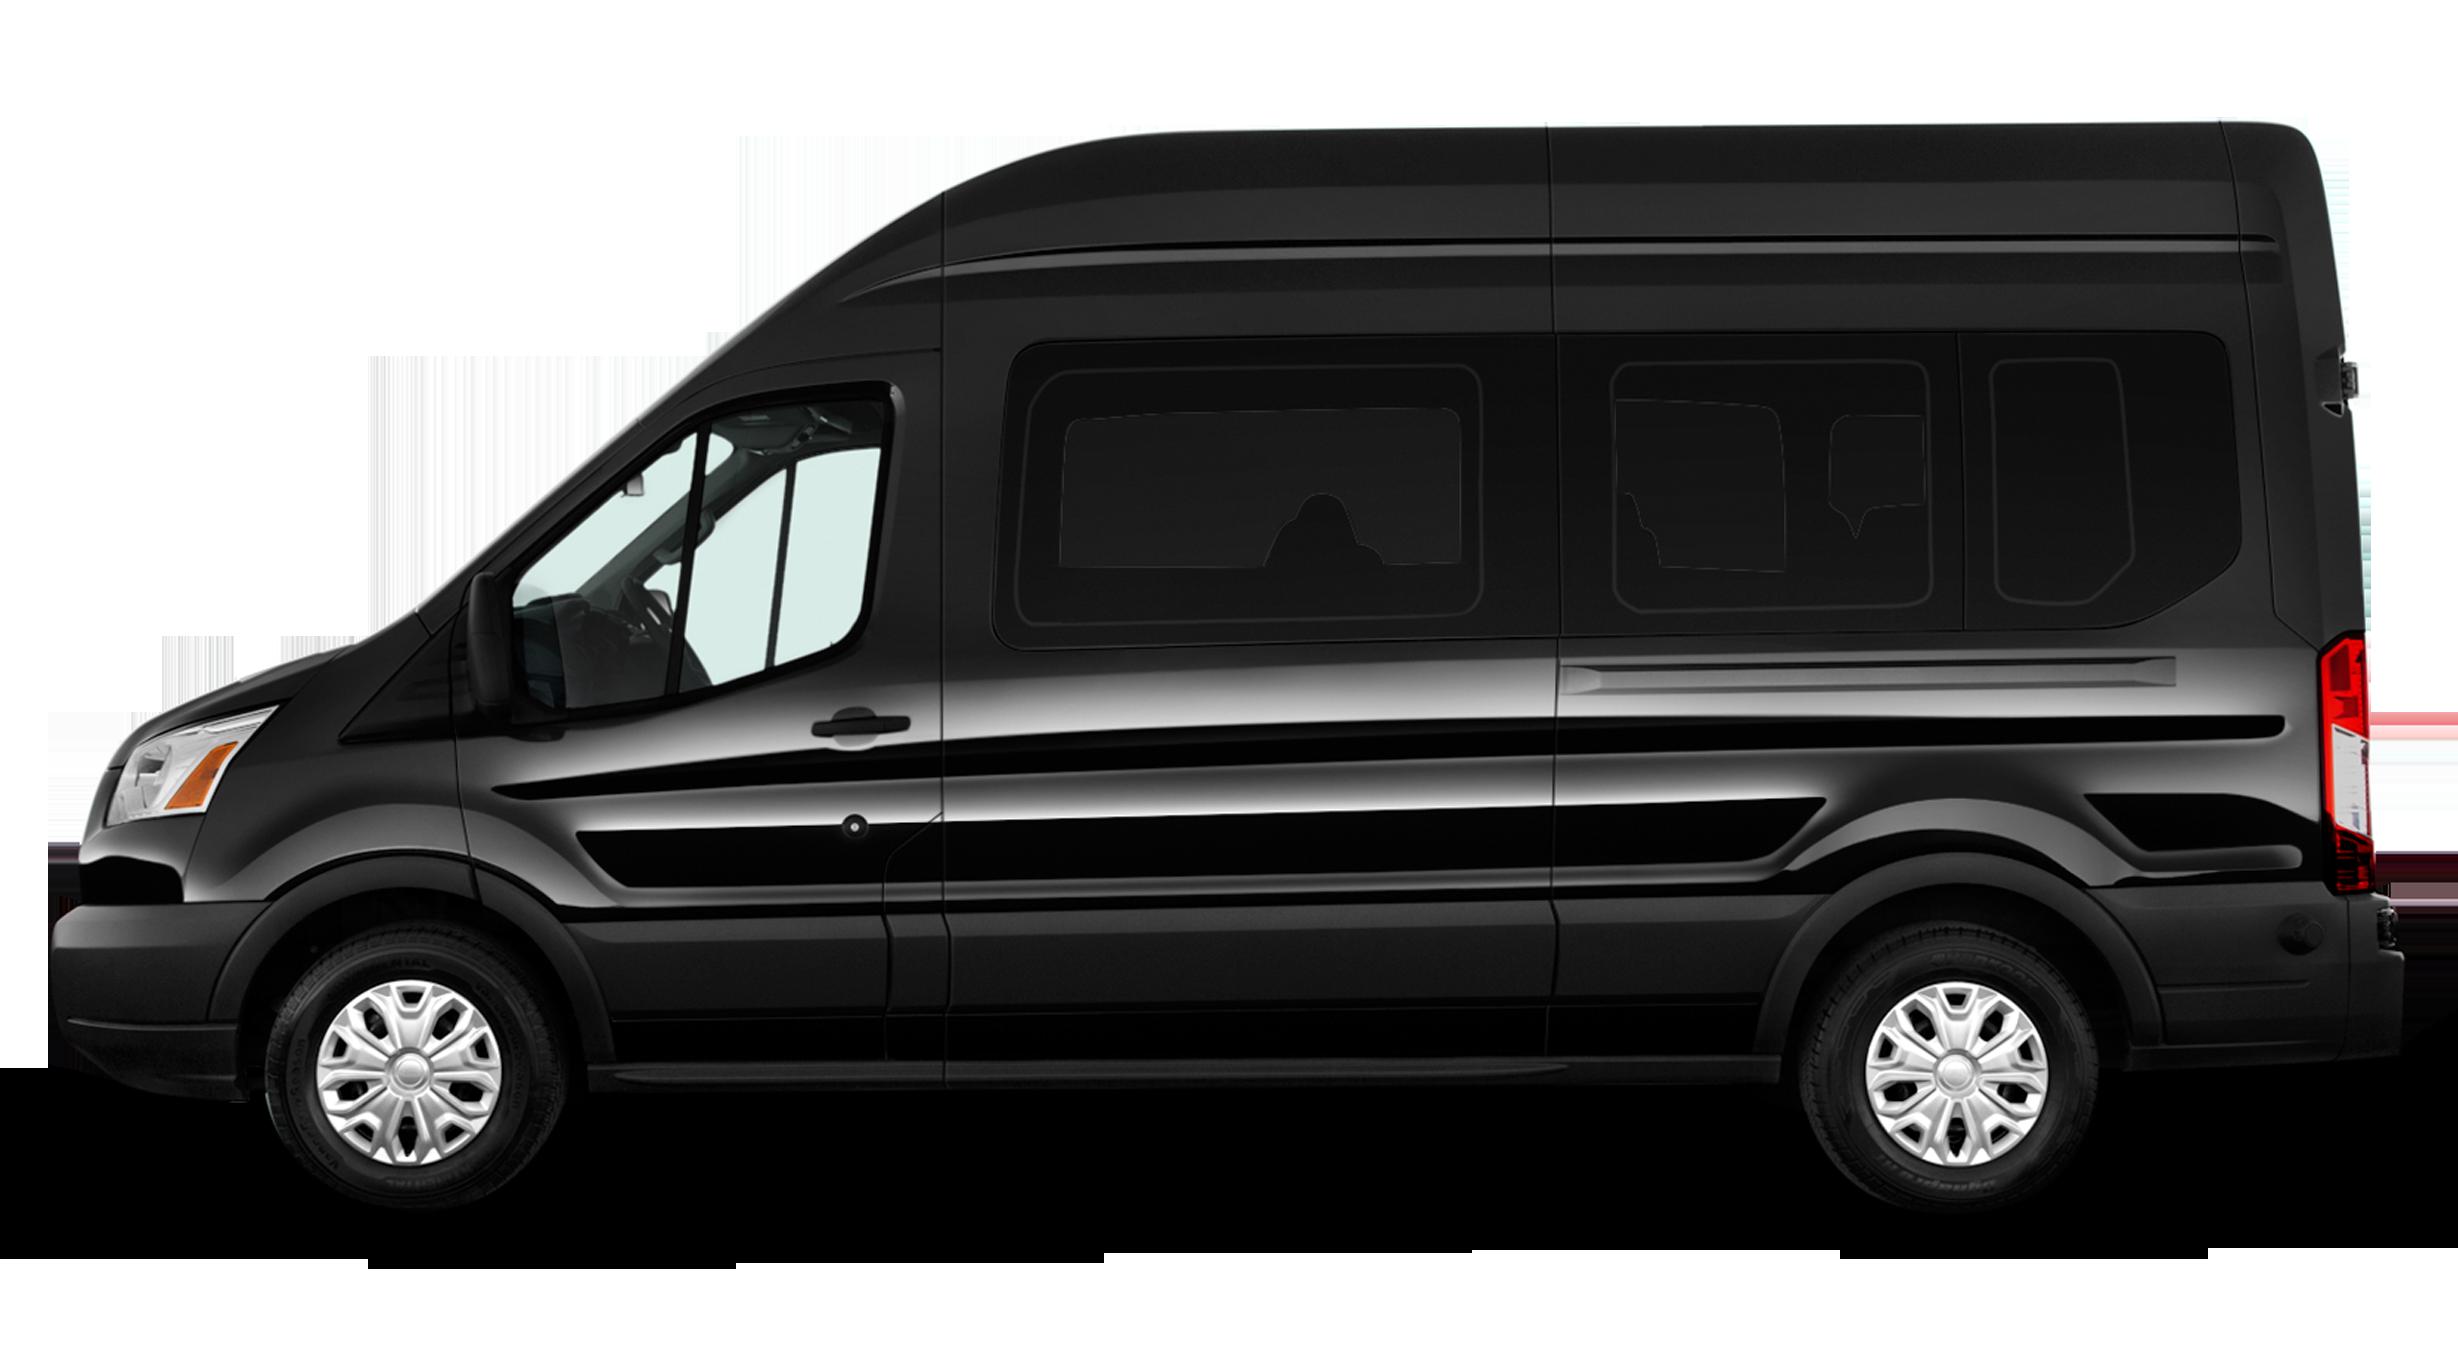 Self drive seater minibus. Minivan clipart van driving